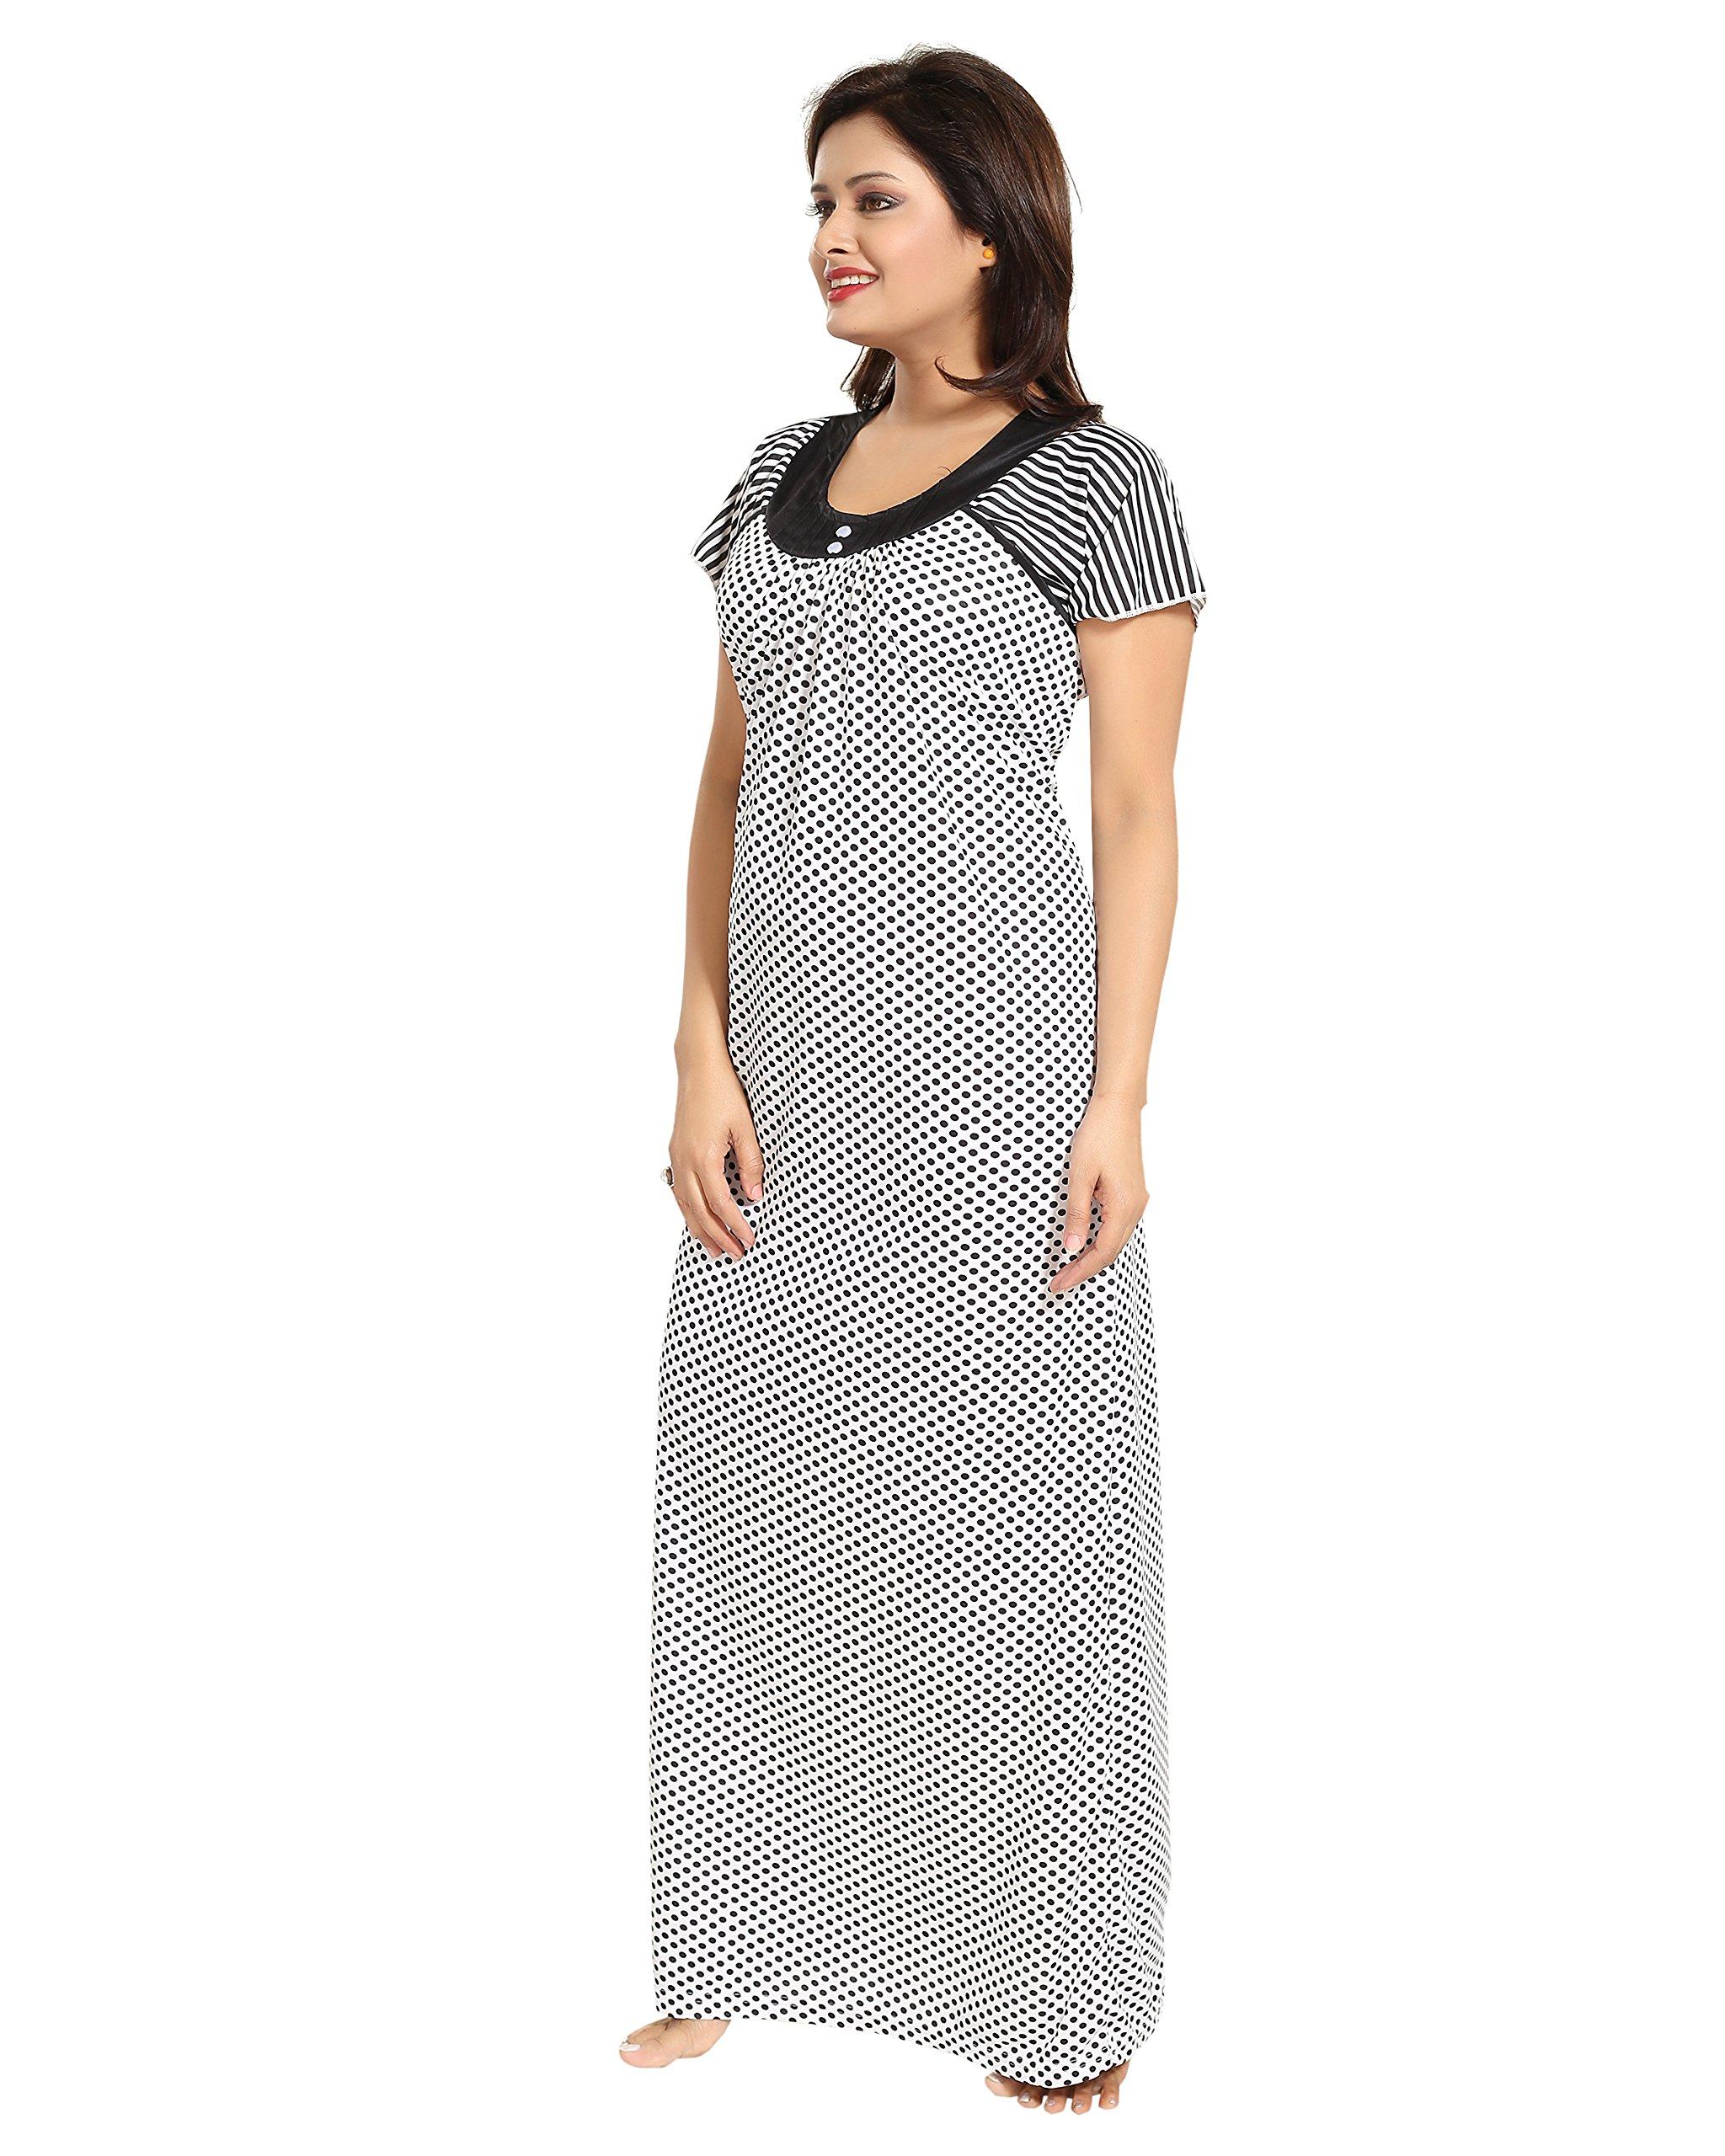 bf83f54c9 TUCUTE Womens Dott s Print Nighty Night Gown Night Dress (Free Size ...